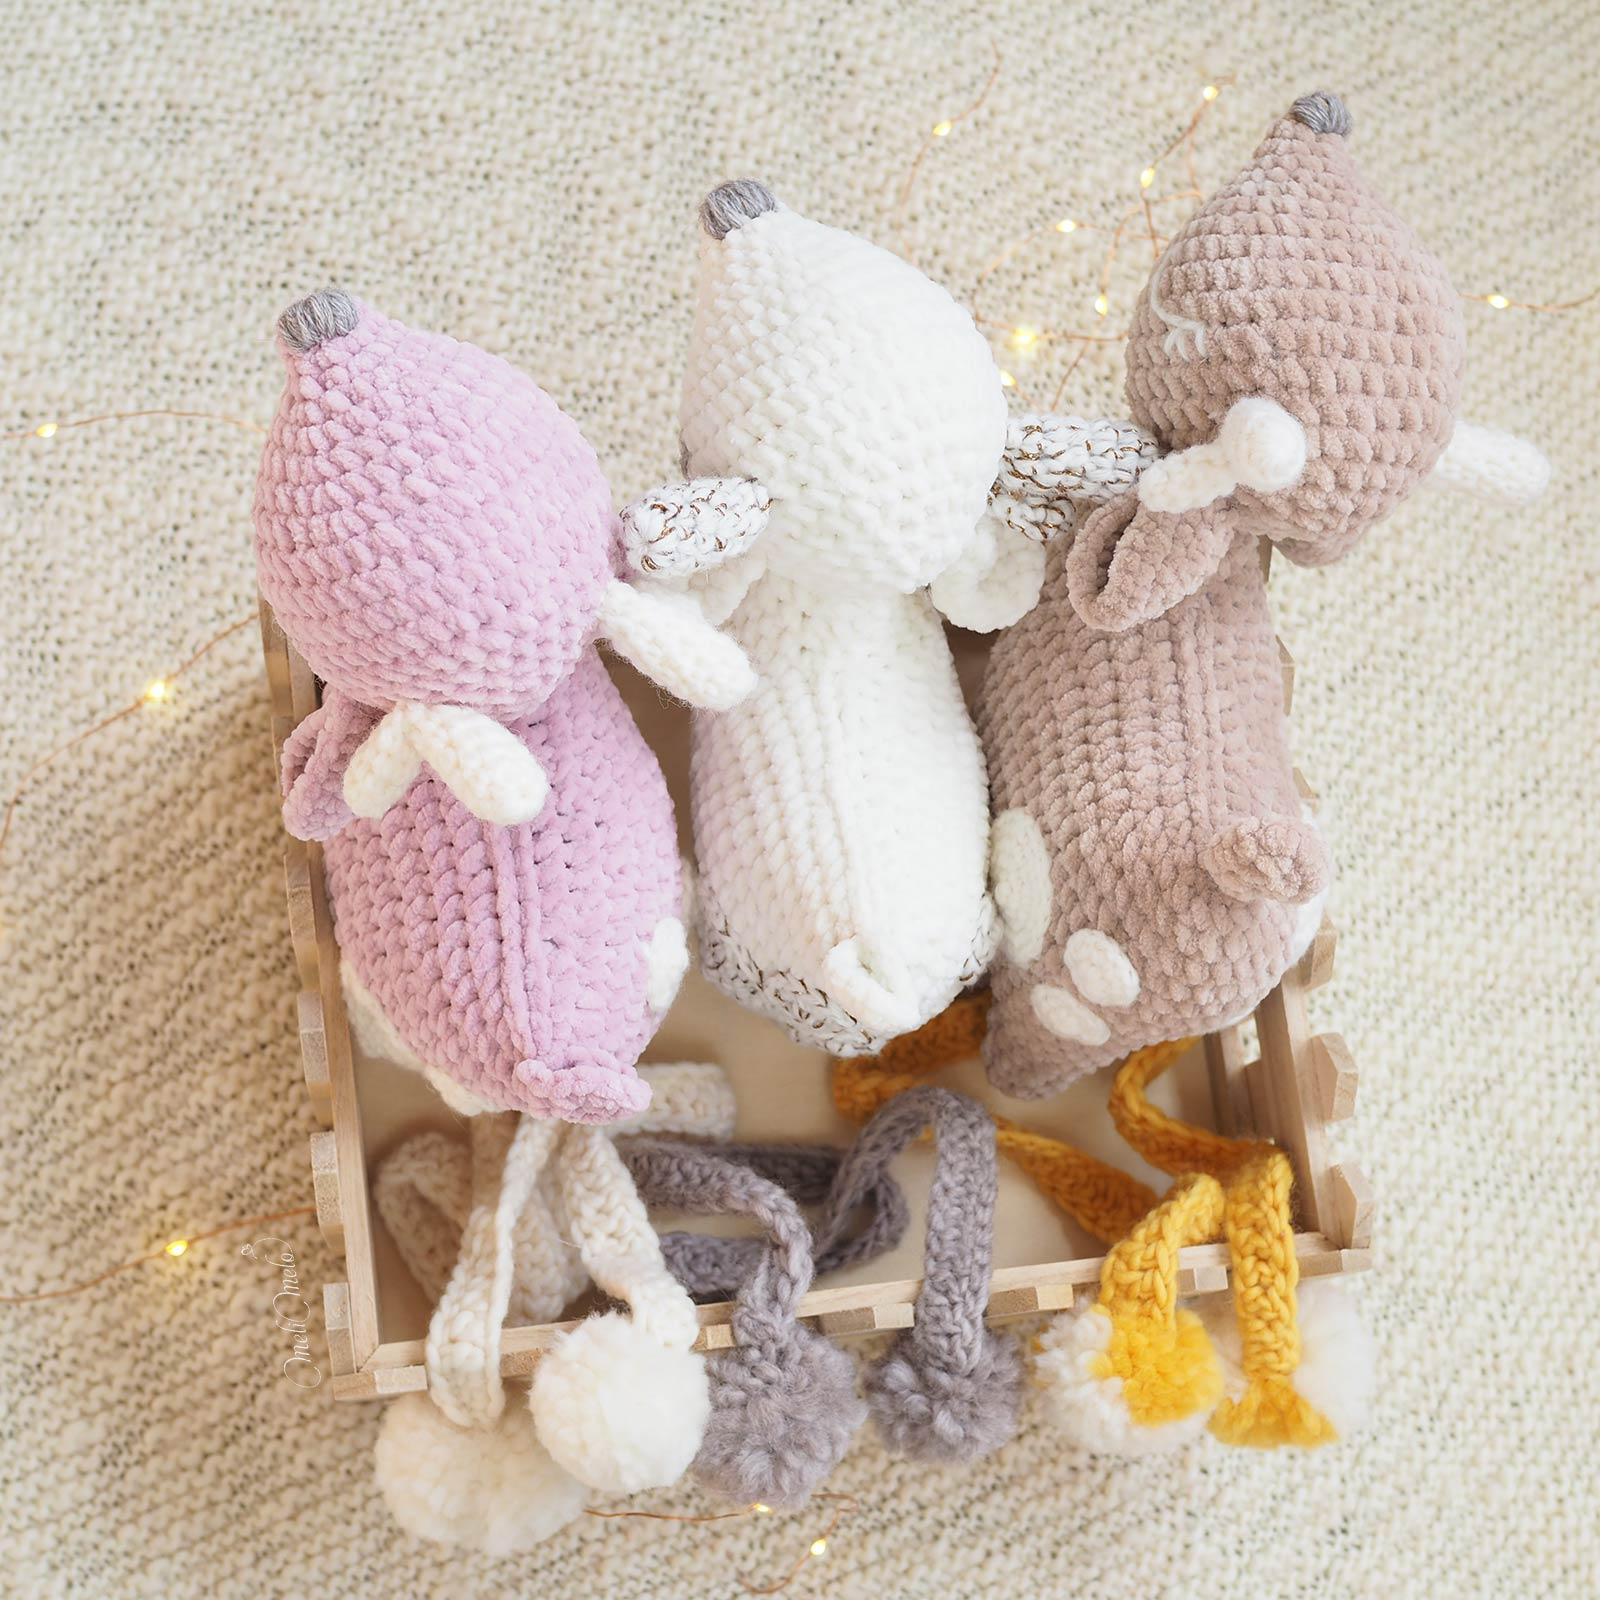 trio-biches-bambi-doudou-amigurumi-crochet-laboutiquedemelimelo